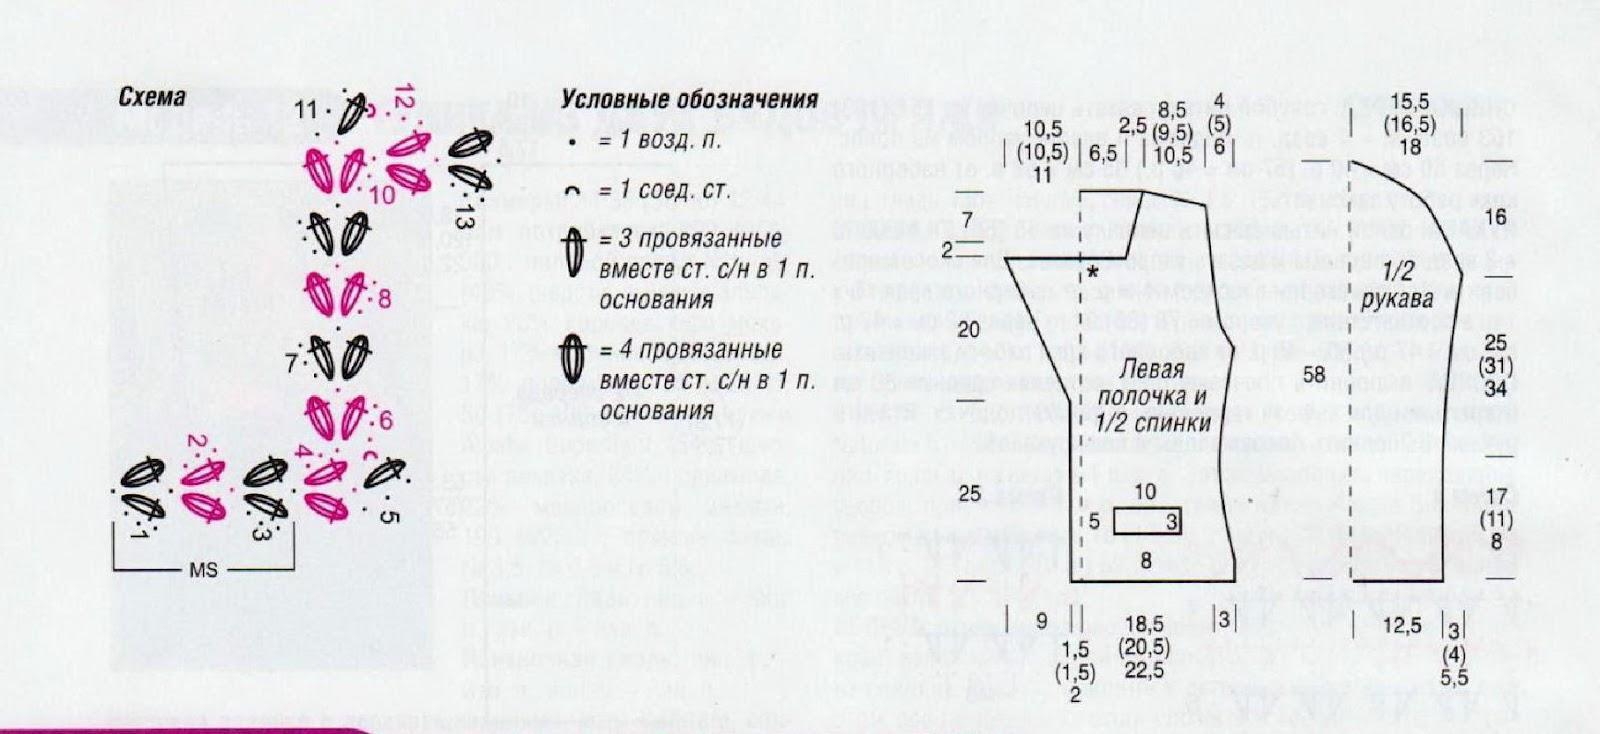 Схема включения транзистора pnp